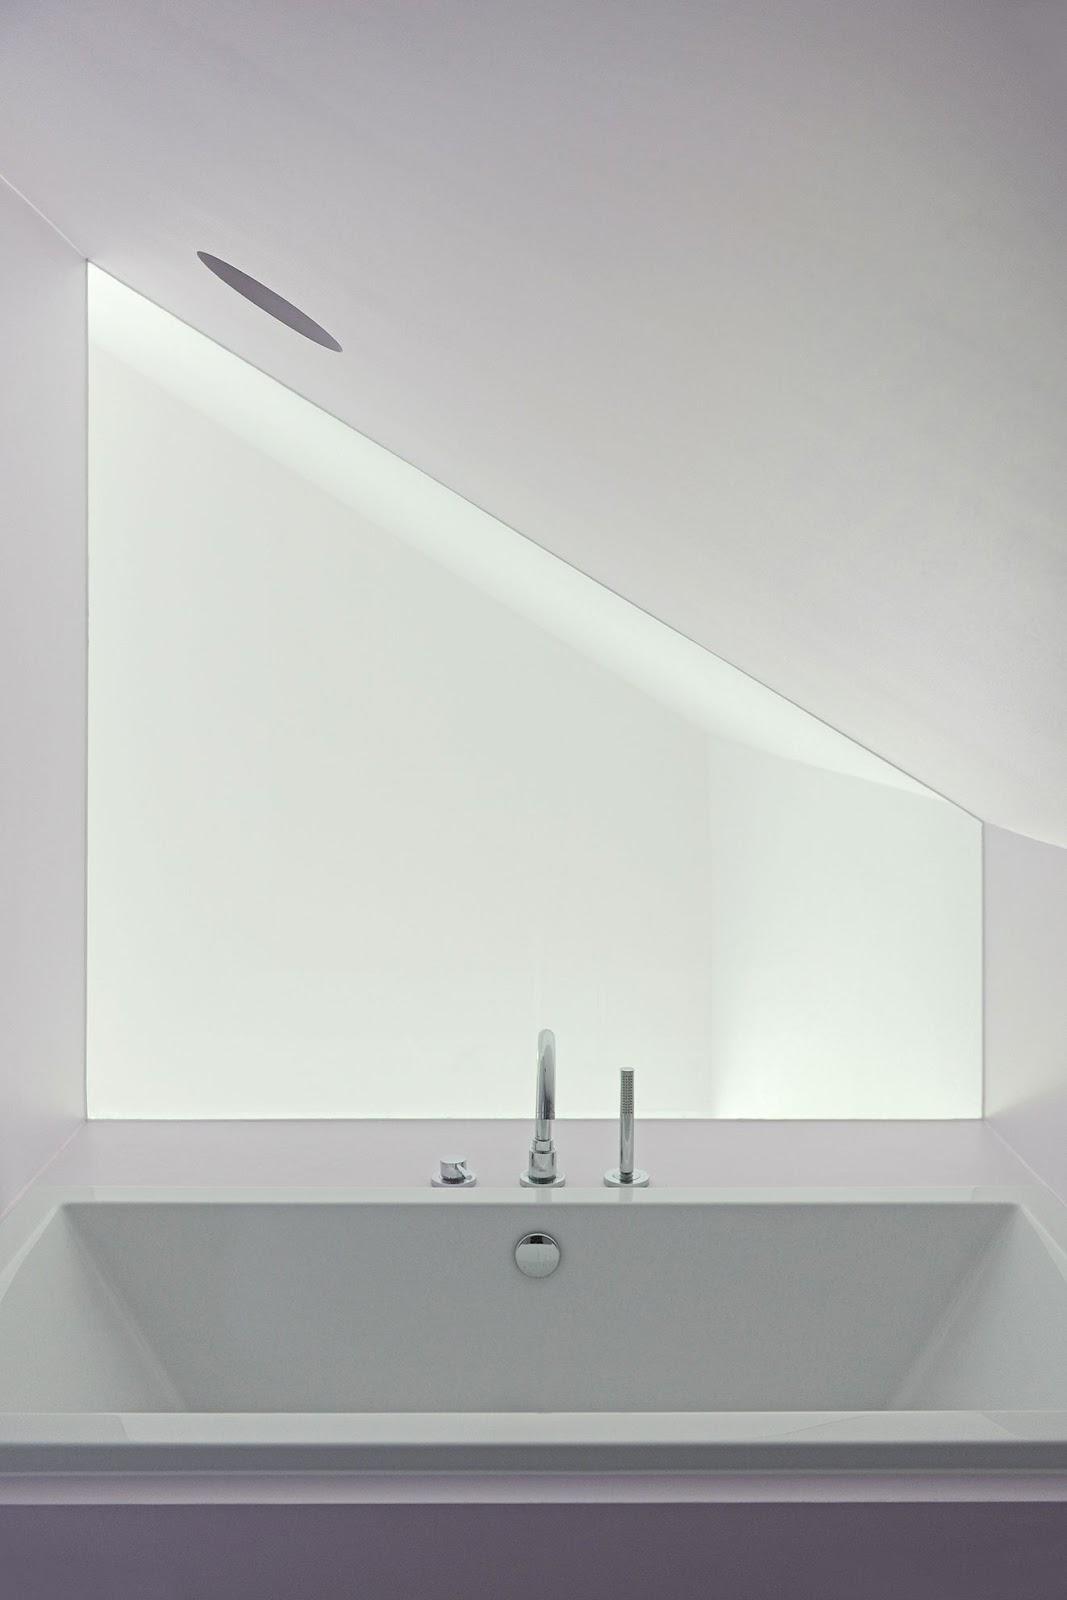 a f a s i a dyrda fikus architekci. Black Bedroom Furniture Sets. Home Design Ideas